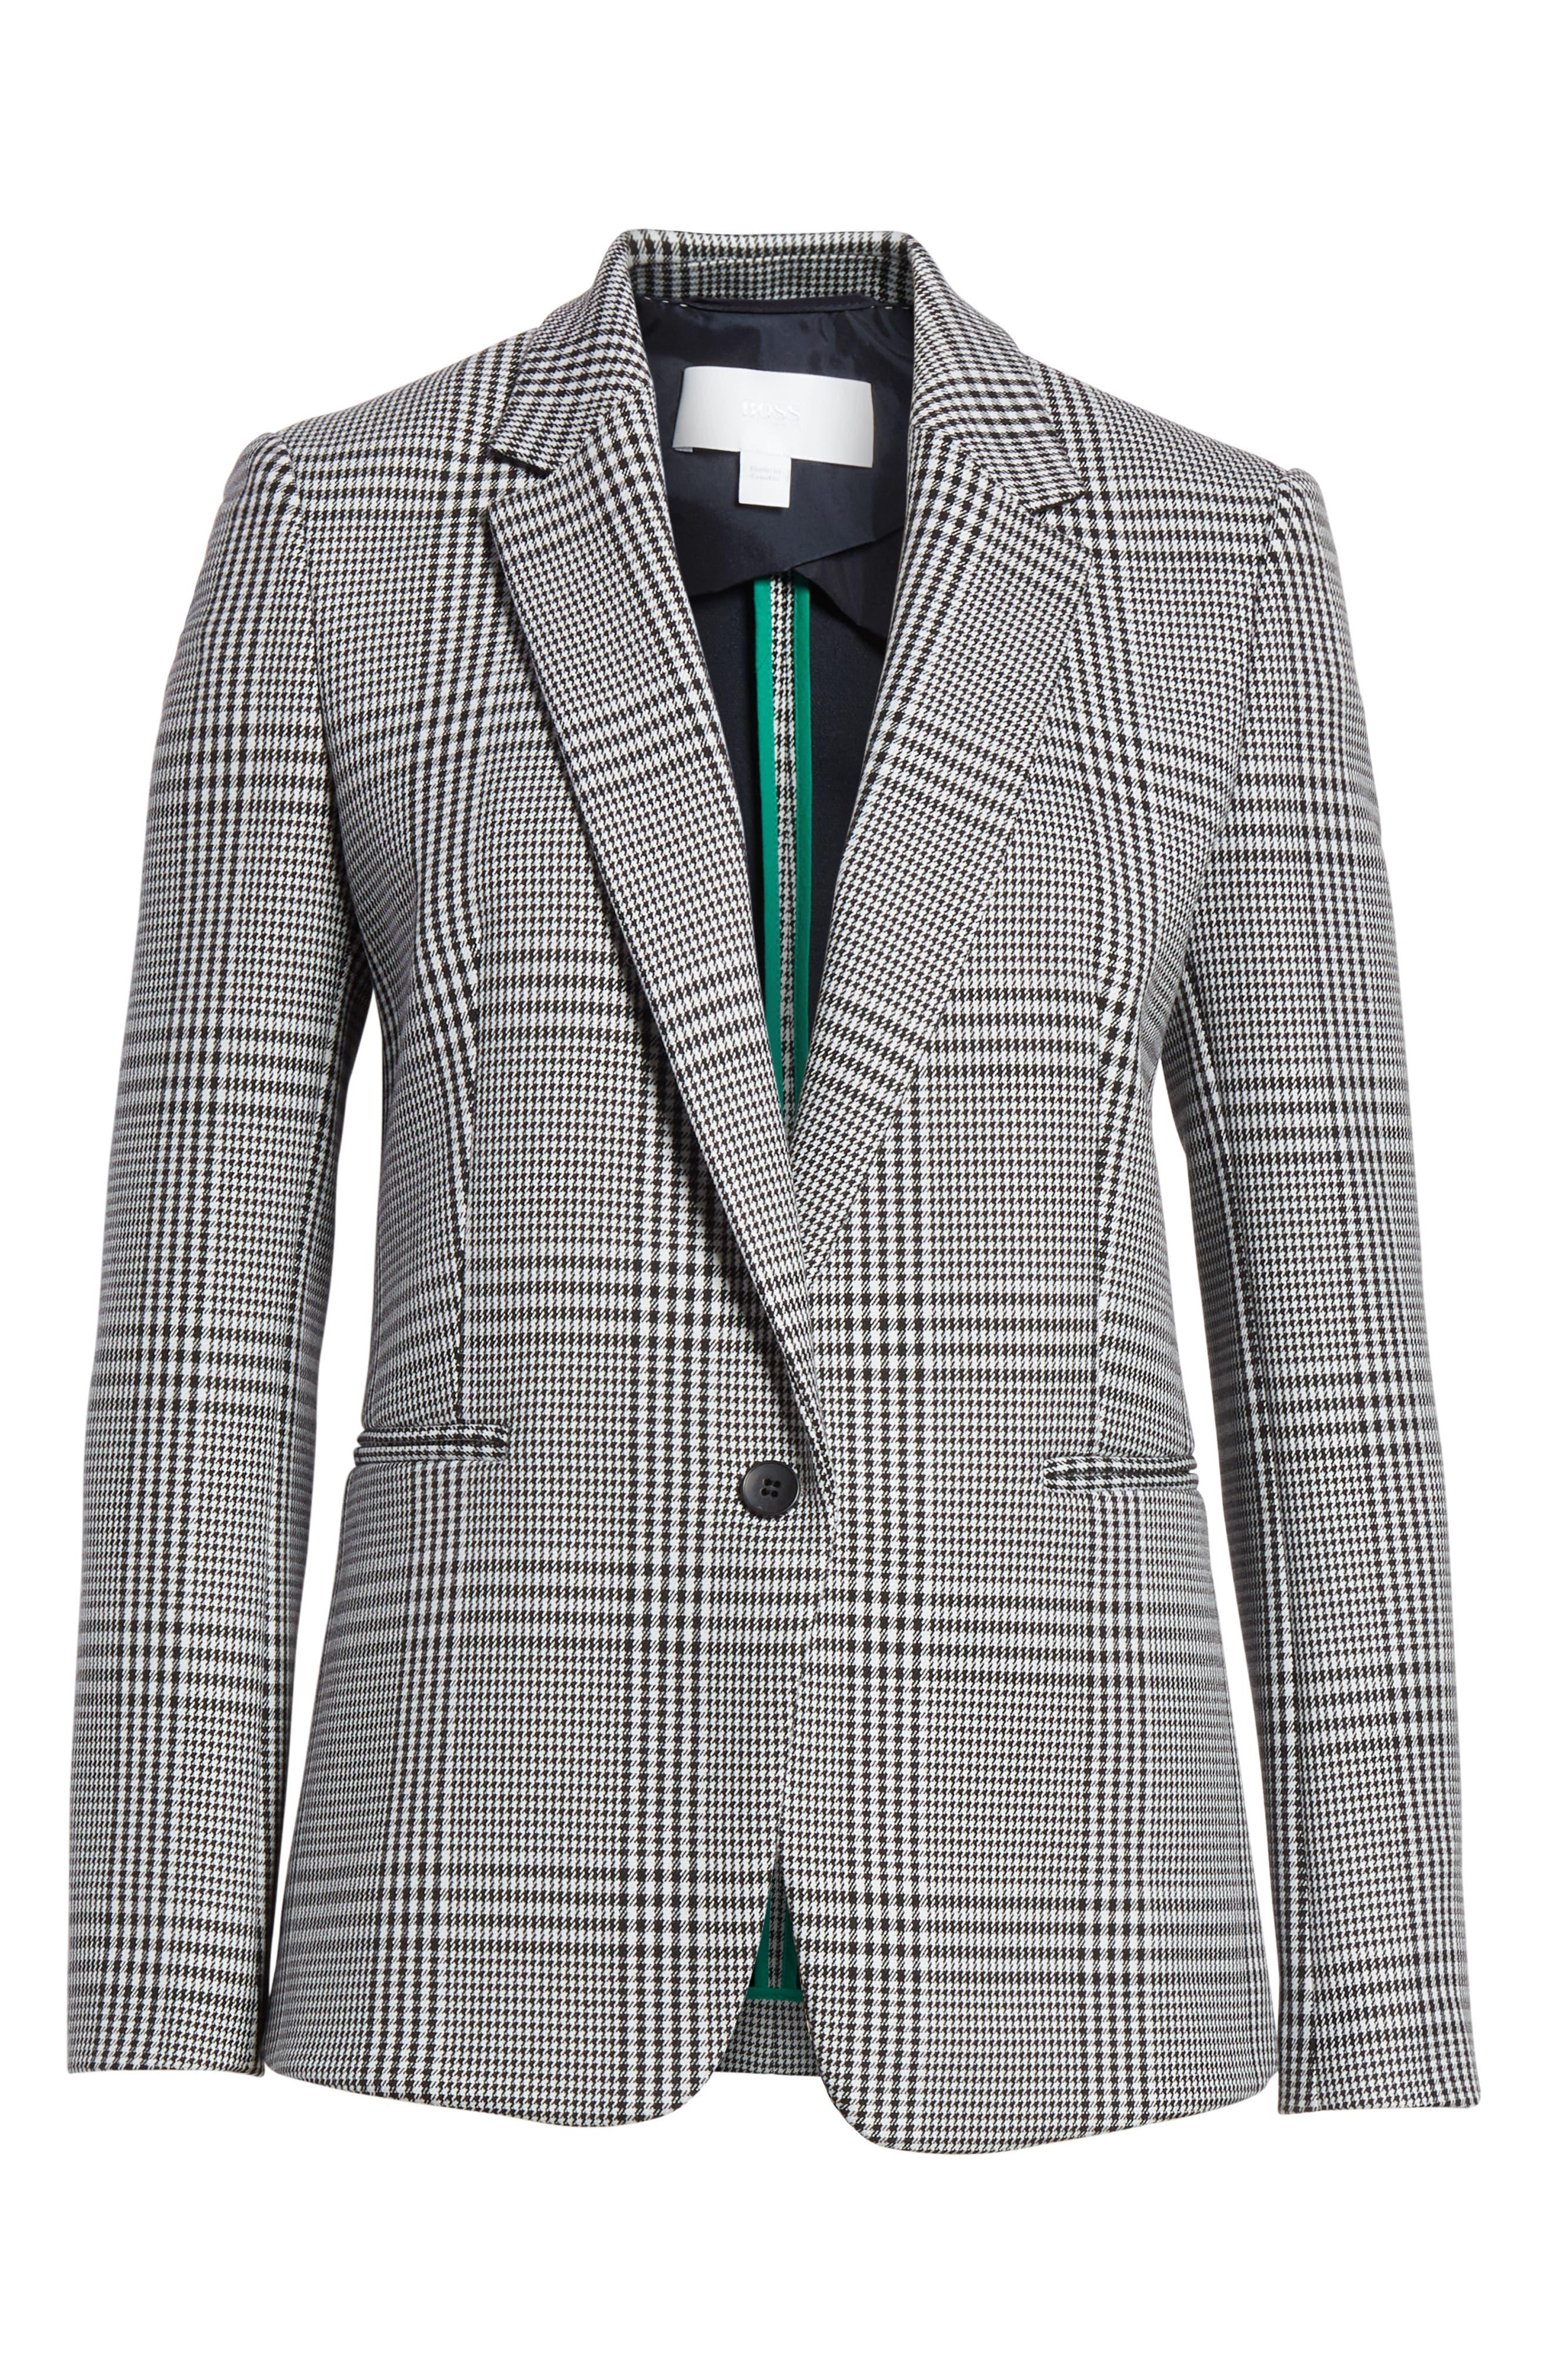 Jemaromina Glen Plaid Suit Jacket,                             Alternate thumbnail 5, color,                             GLENCHECK FANTASY